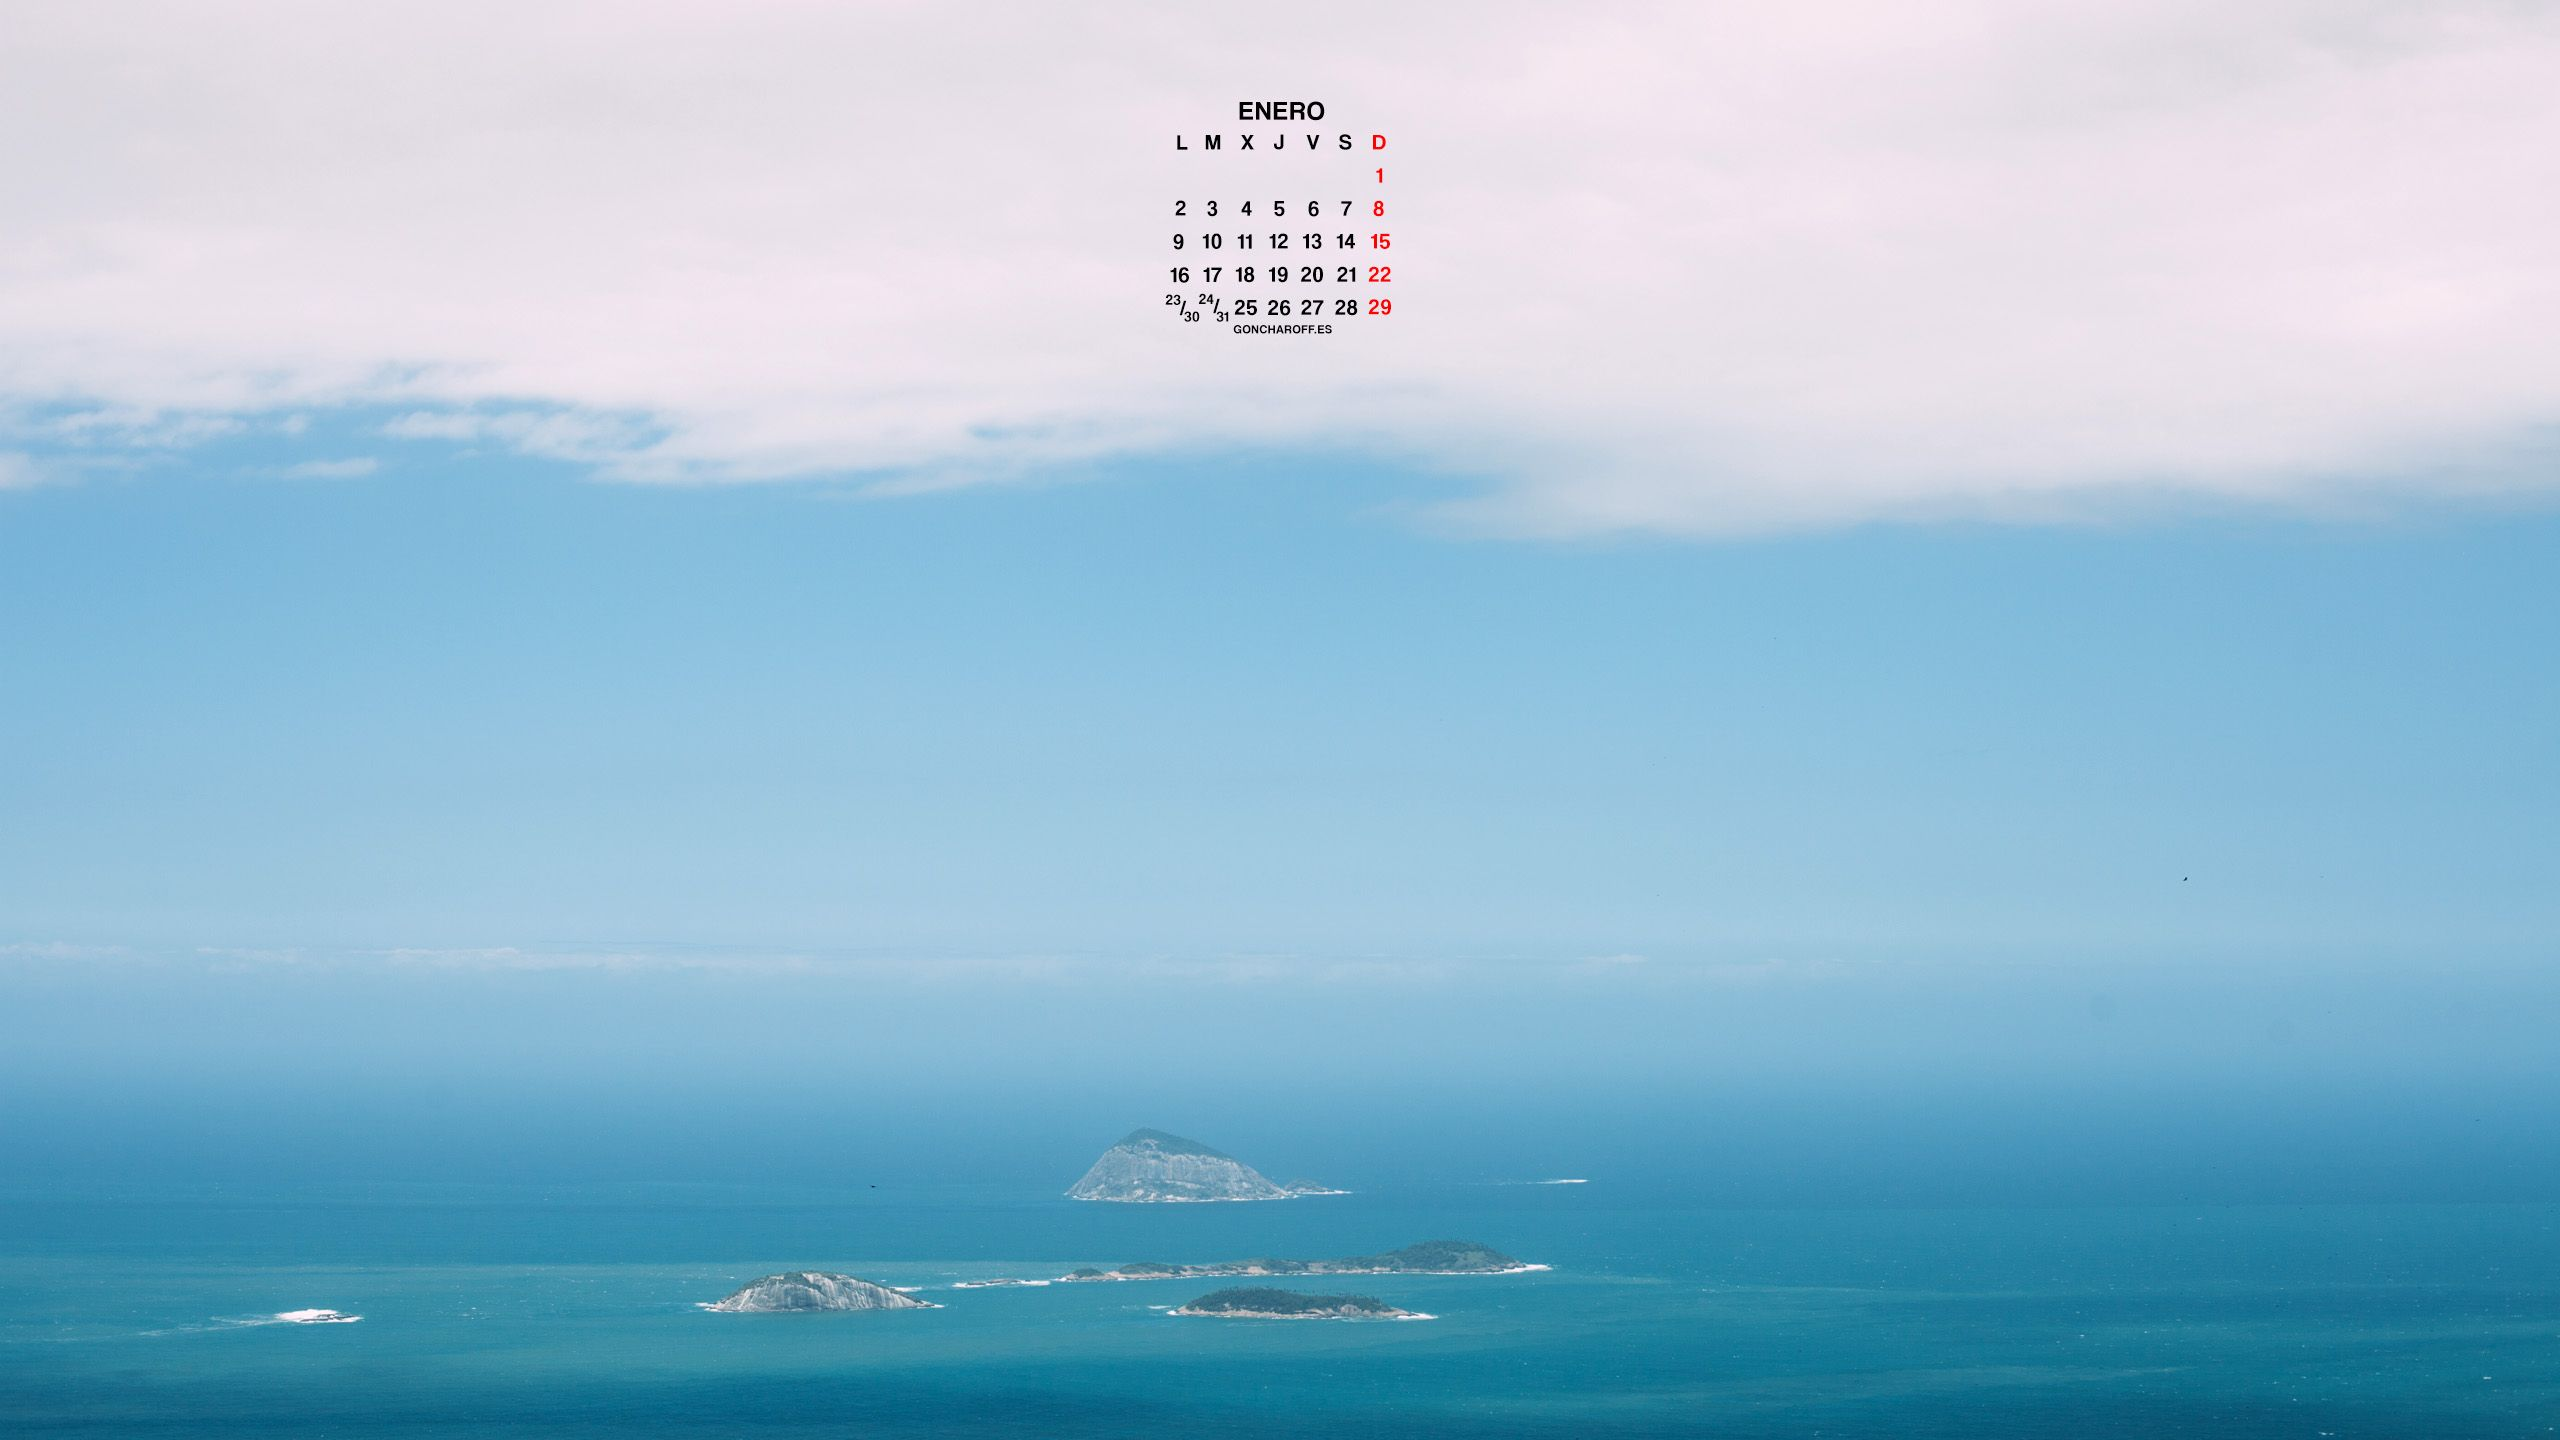 Calendario de Enero 2017 descargar gratis